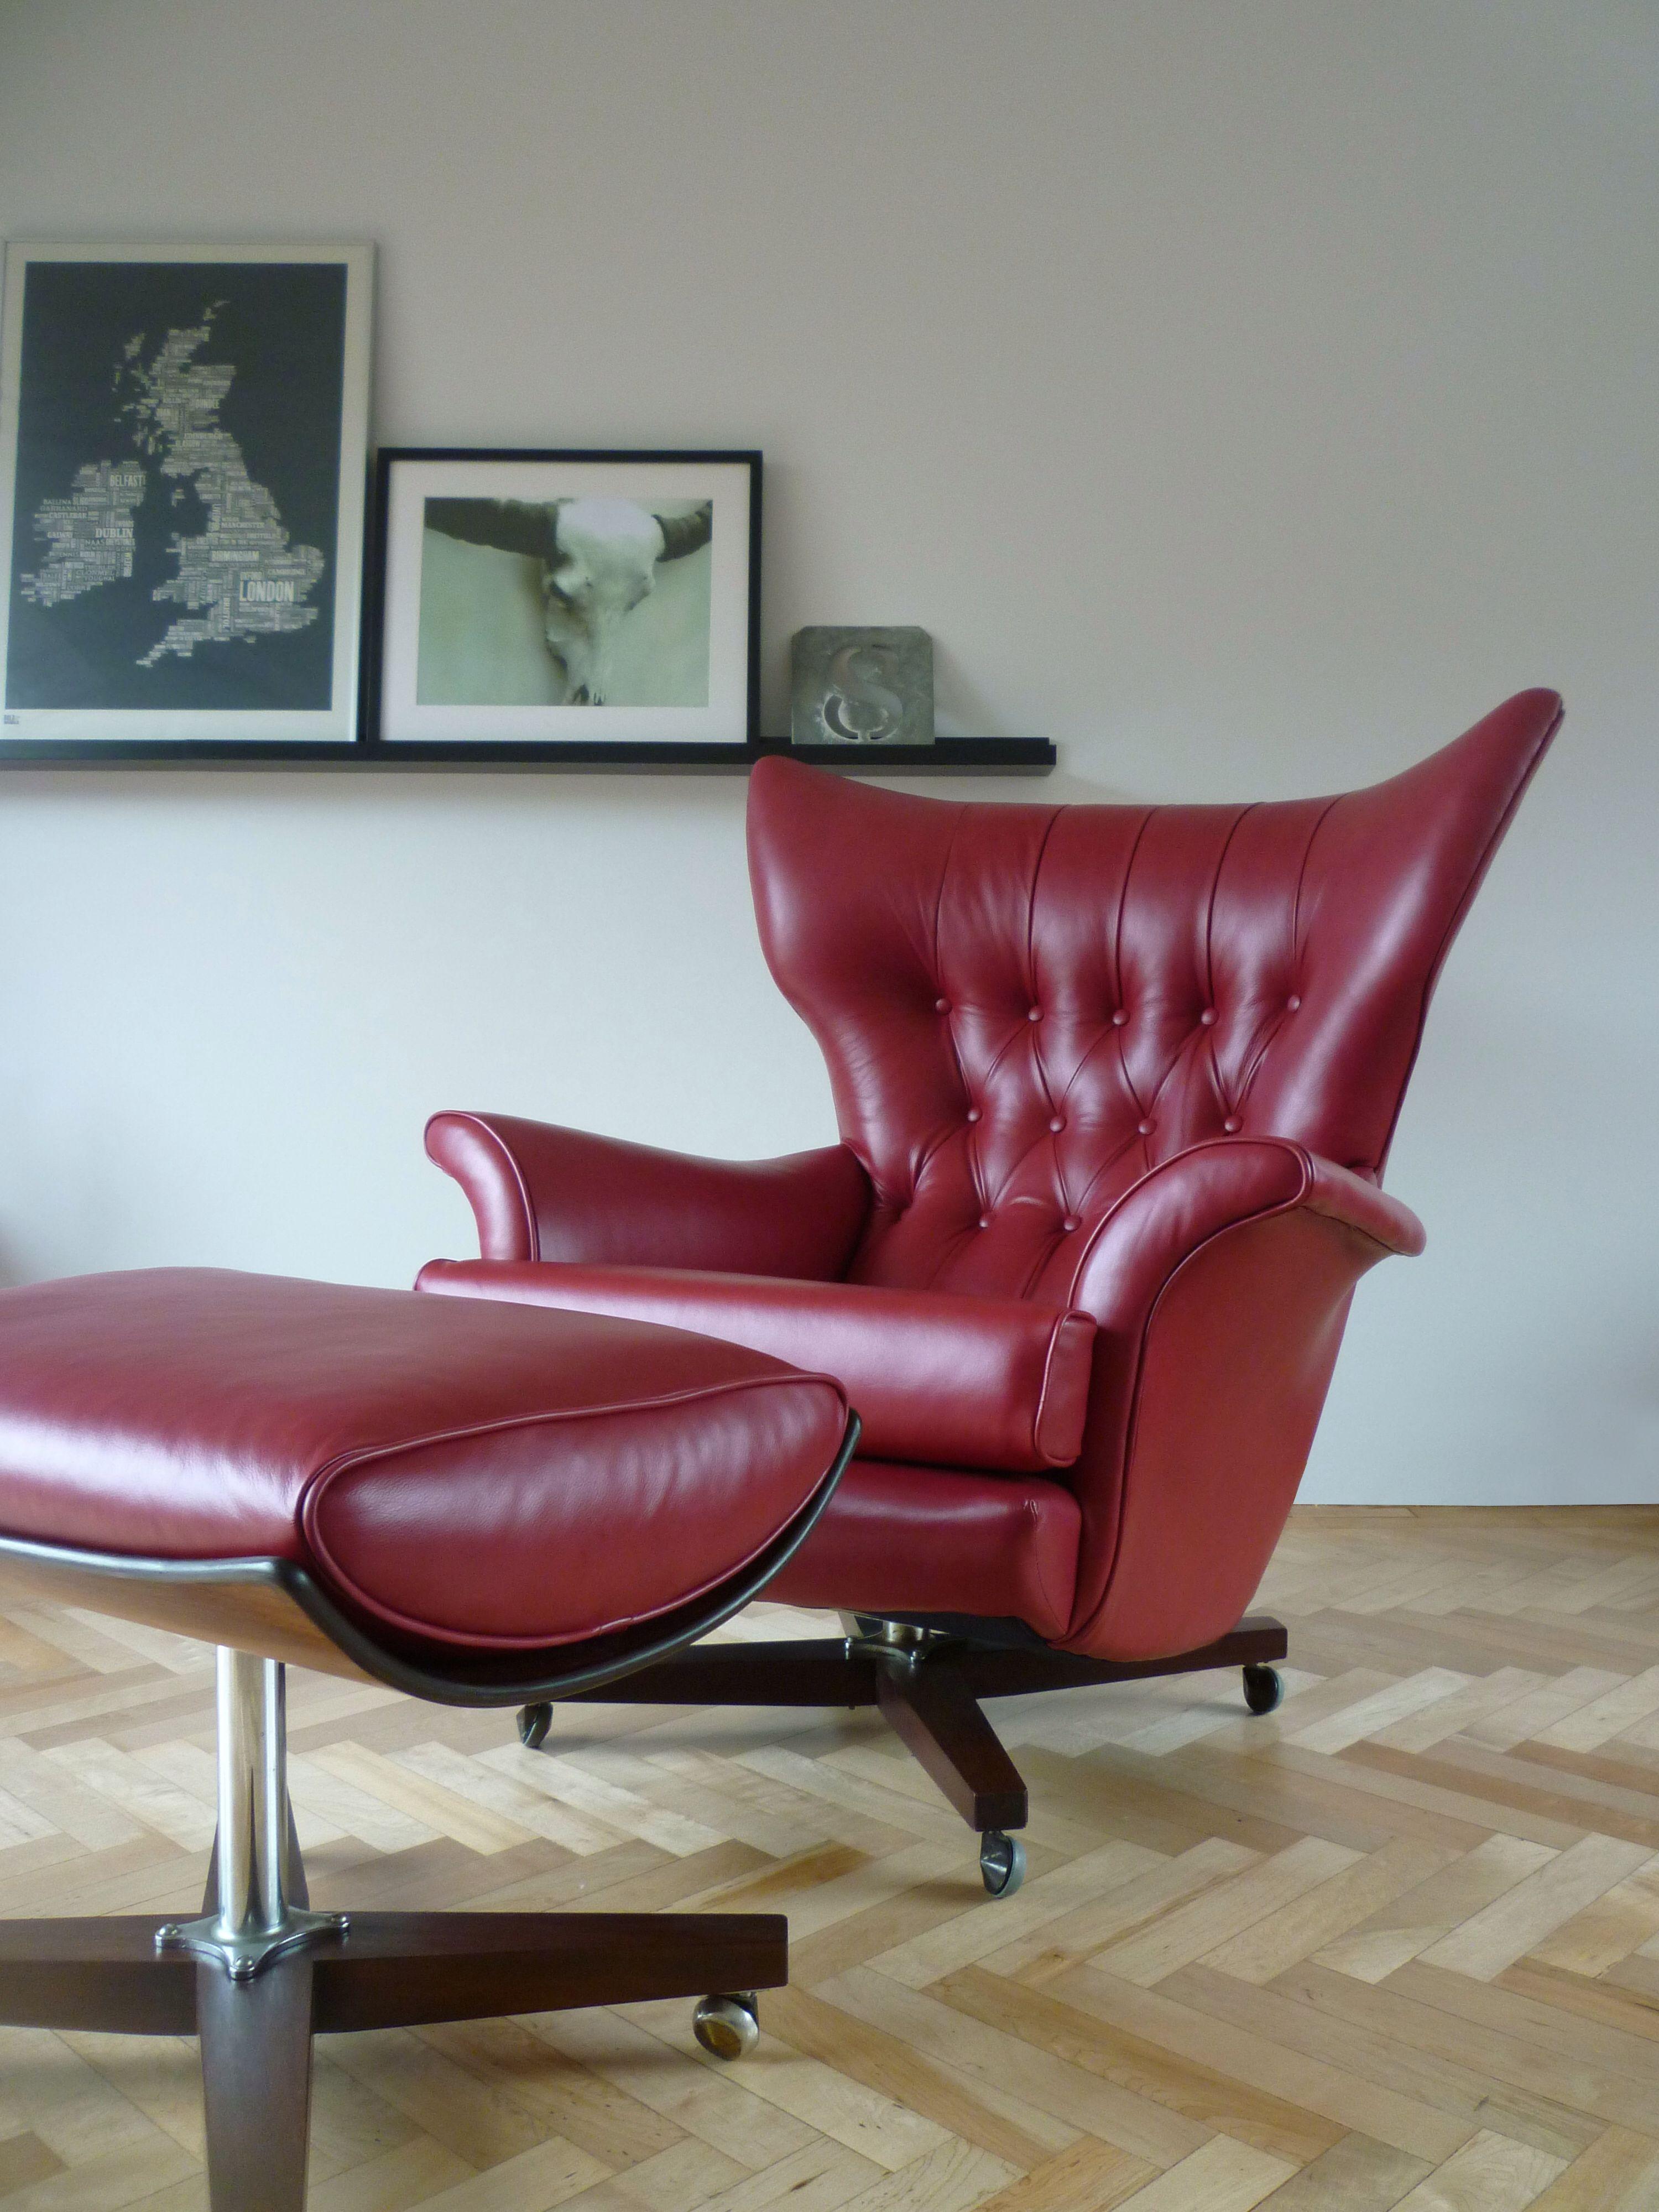 vintage gplan 6250 swivel chair ottoman restored in custom red